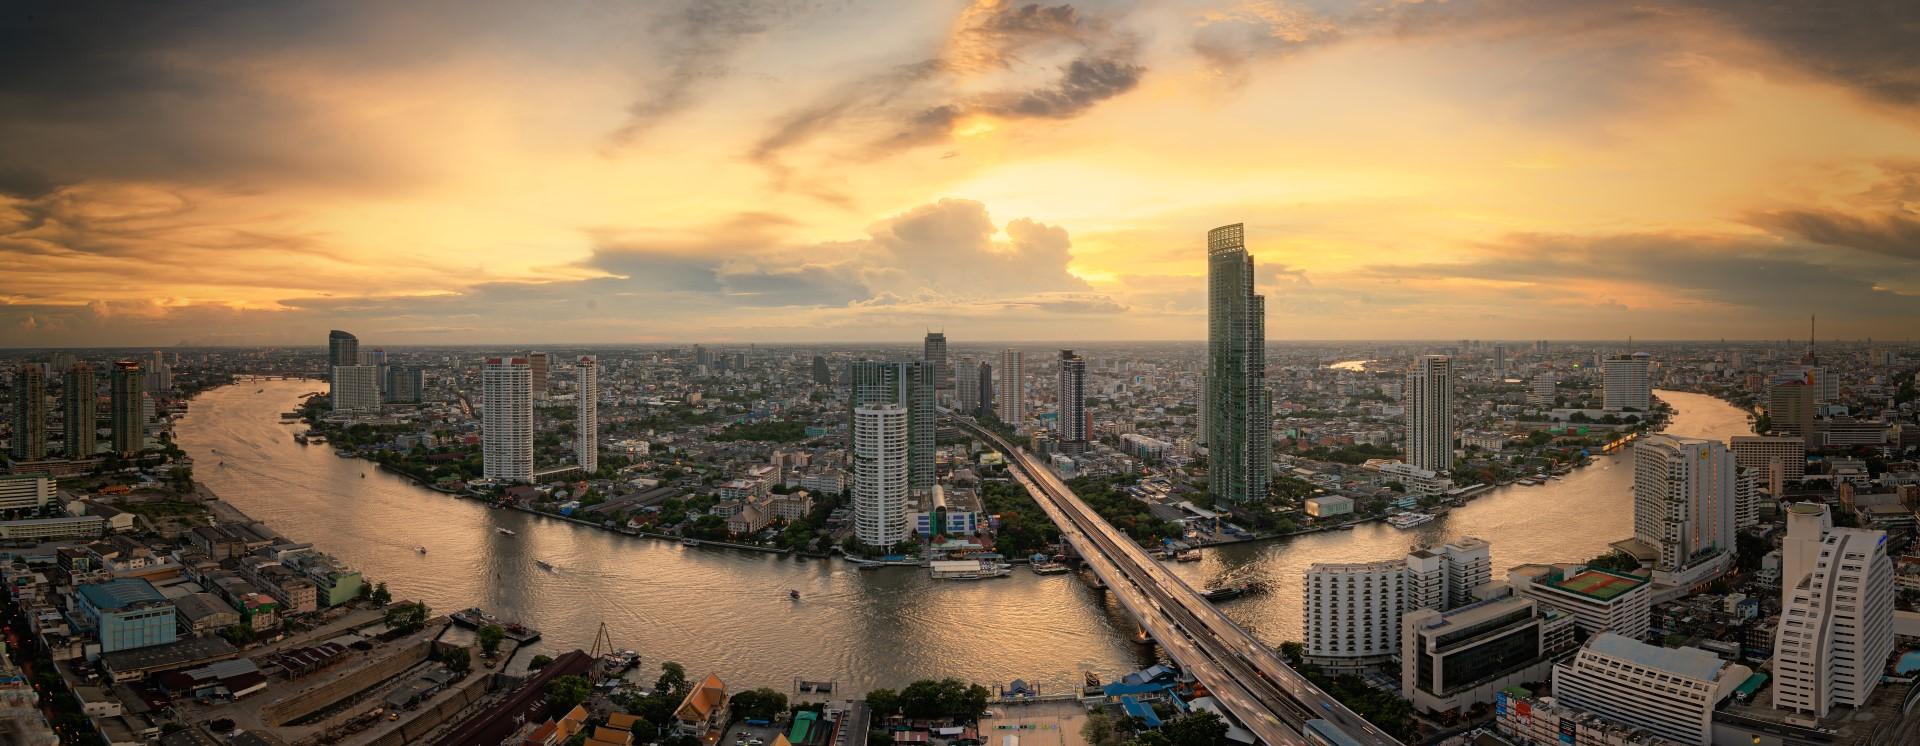 bangkok province city 09